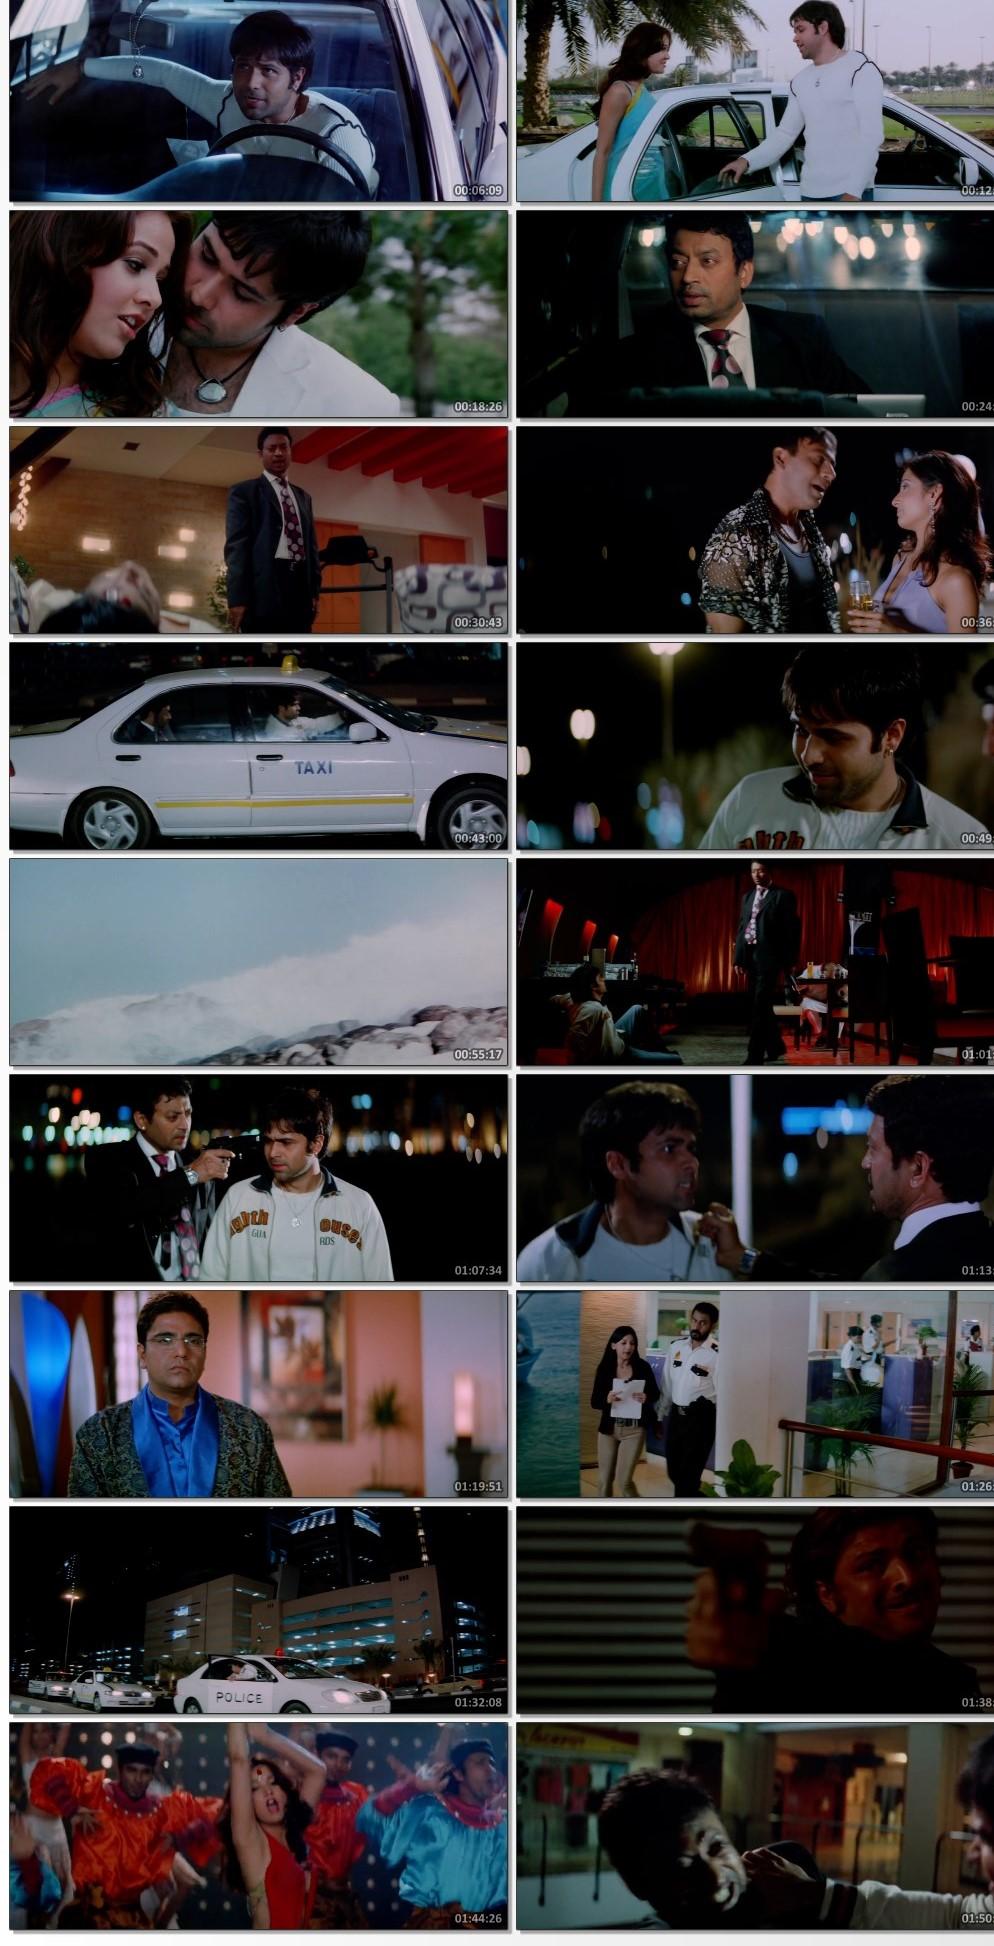 The-Killer-2006-Hindi-720p-WEB-DL-x264-ESubs-1-mkv-thumbs